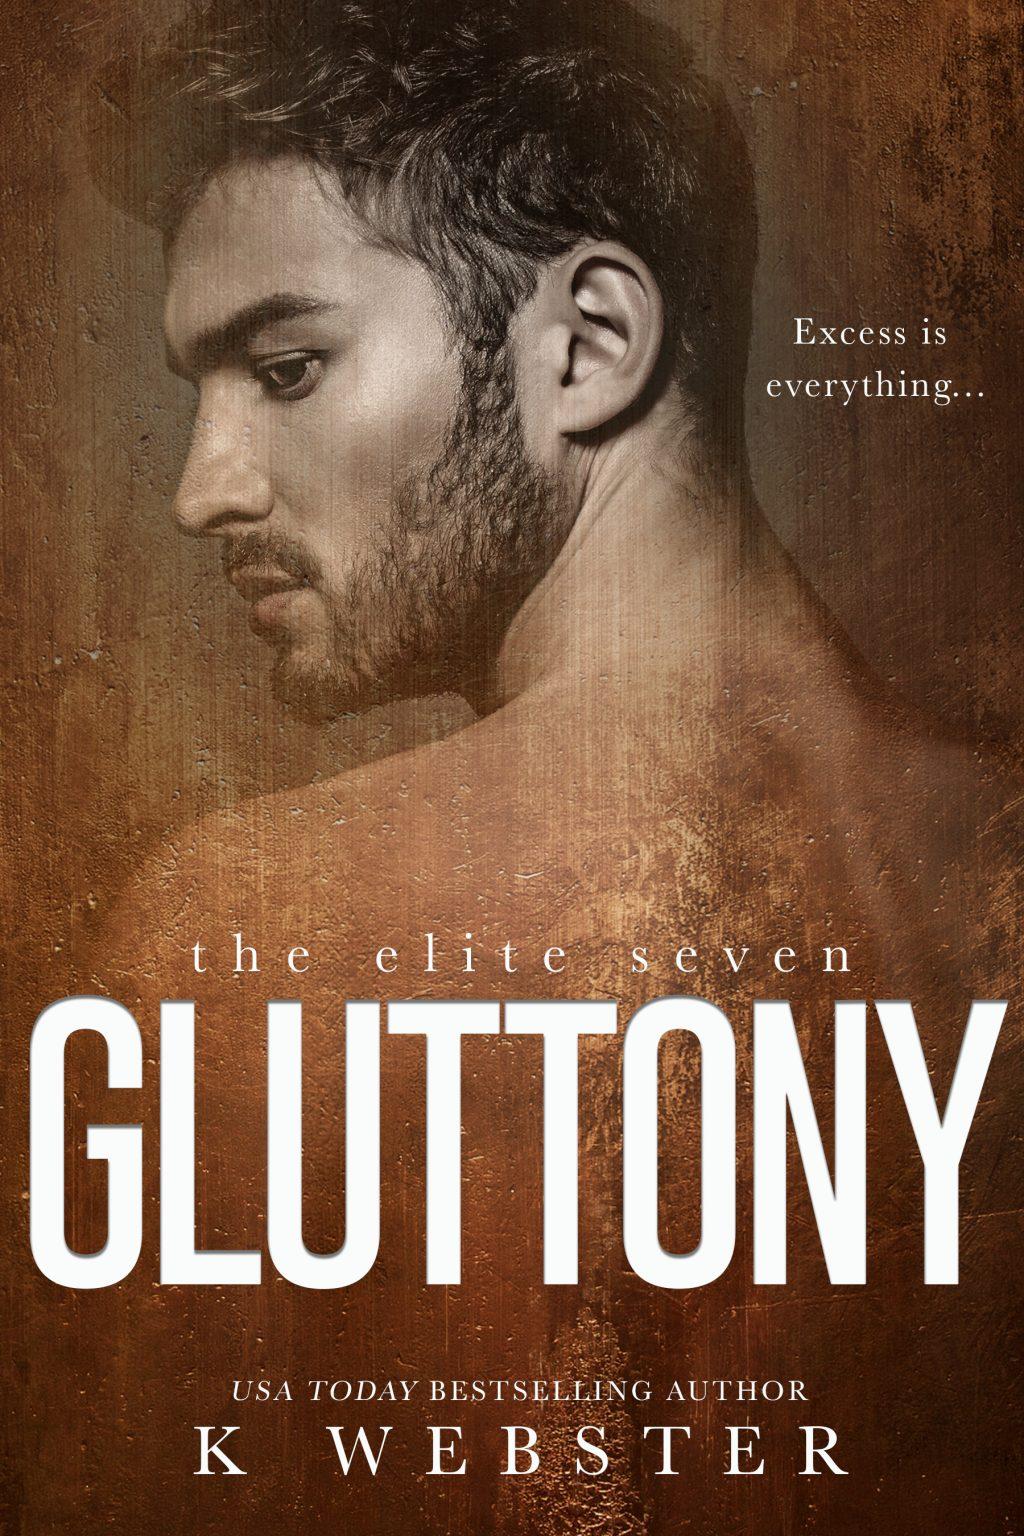 Gluttony (The Elite Seven #5) by K Webser